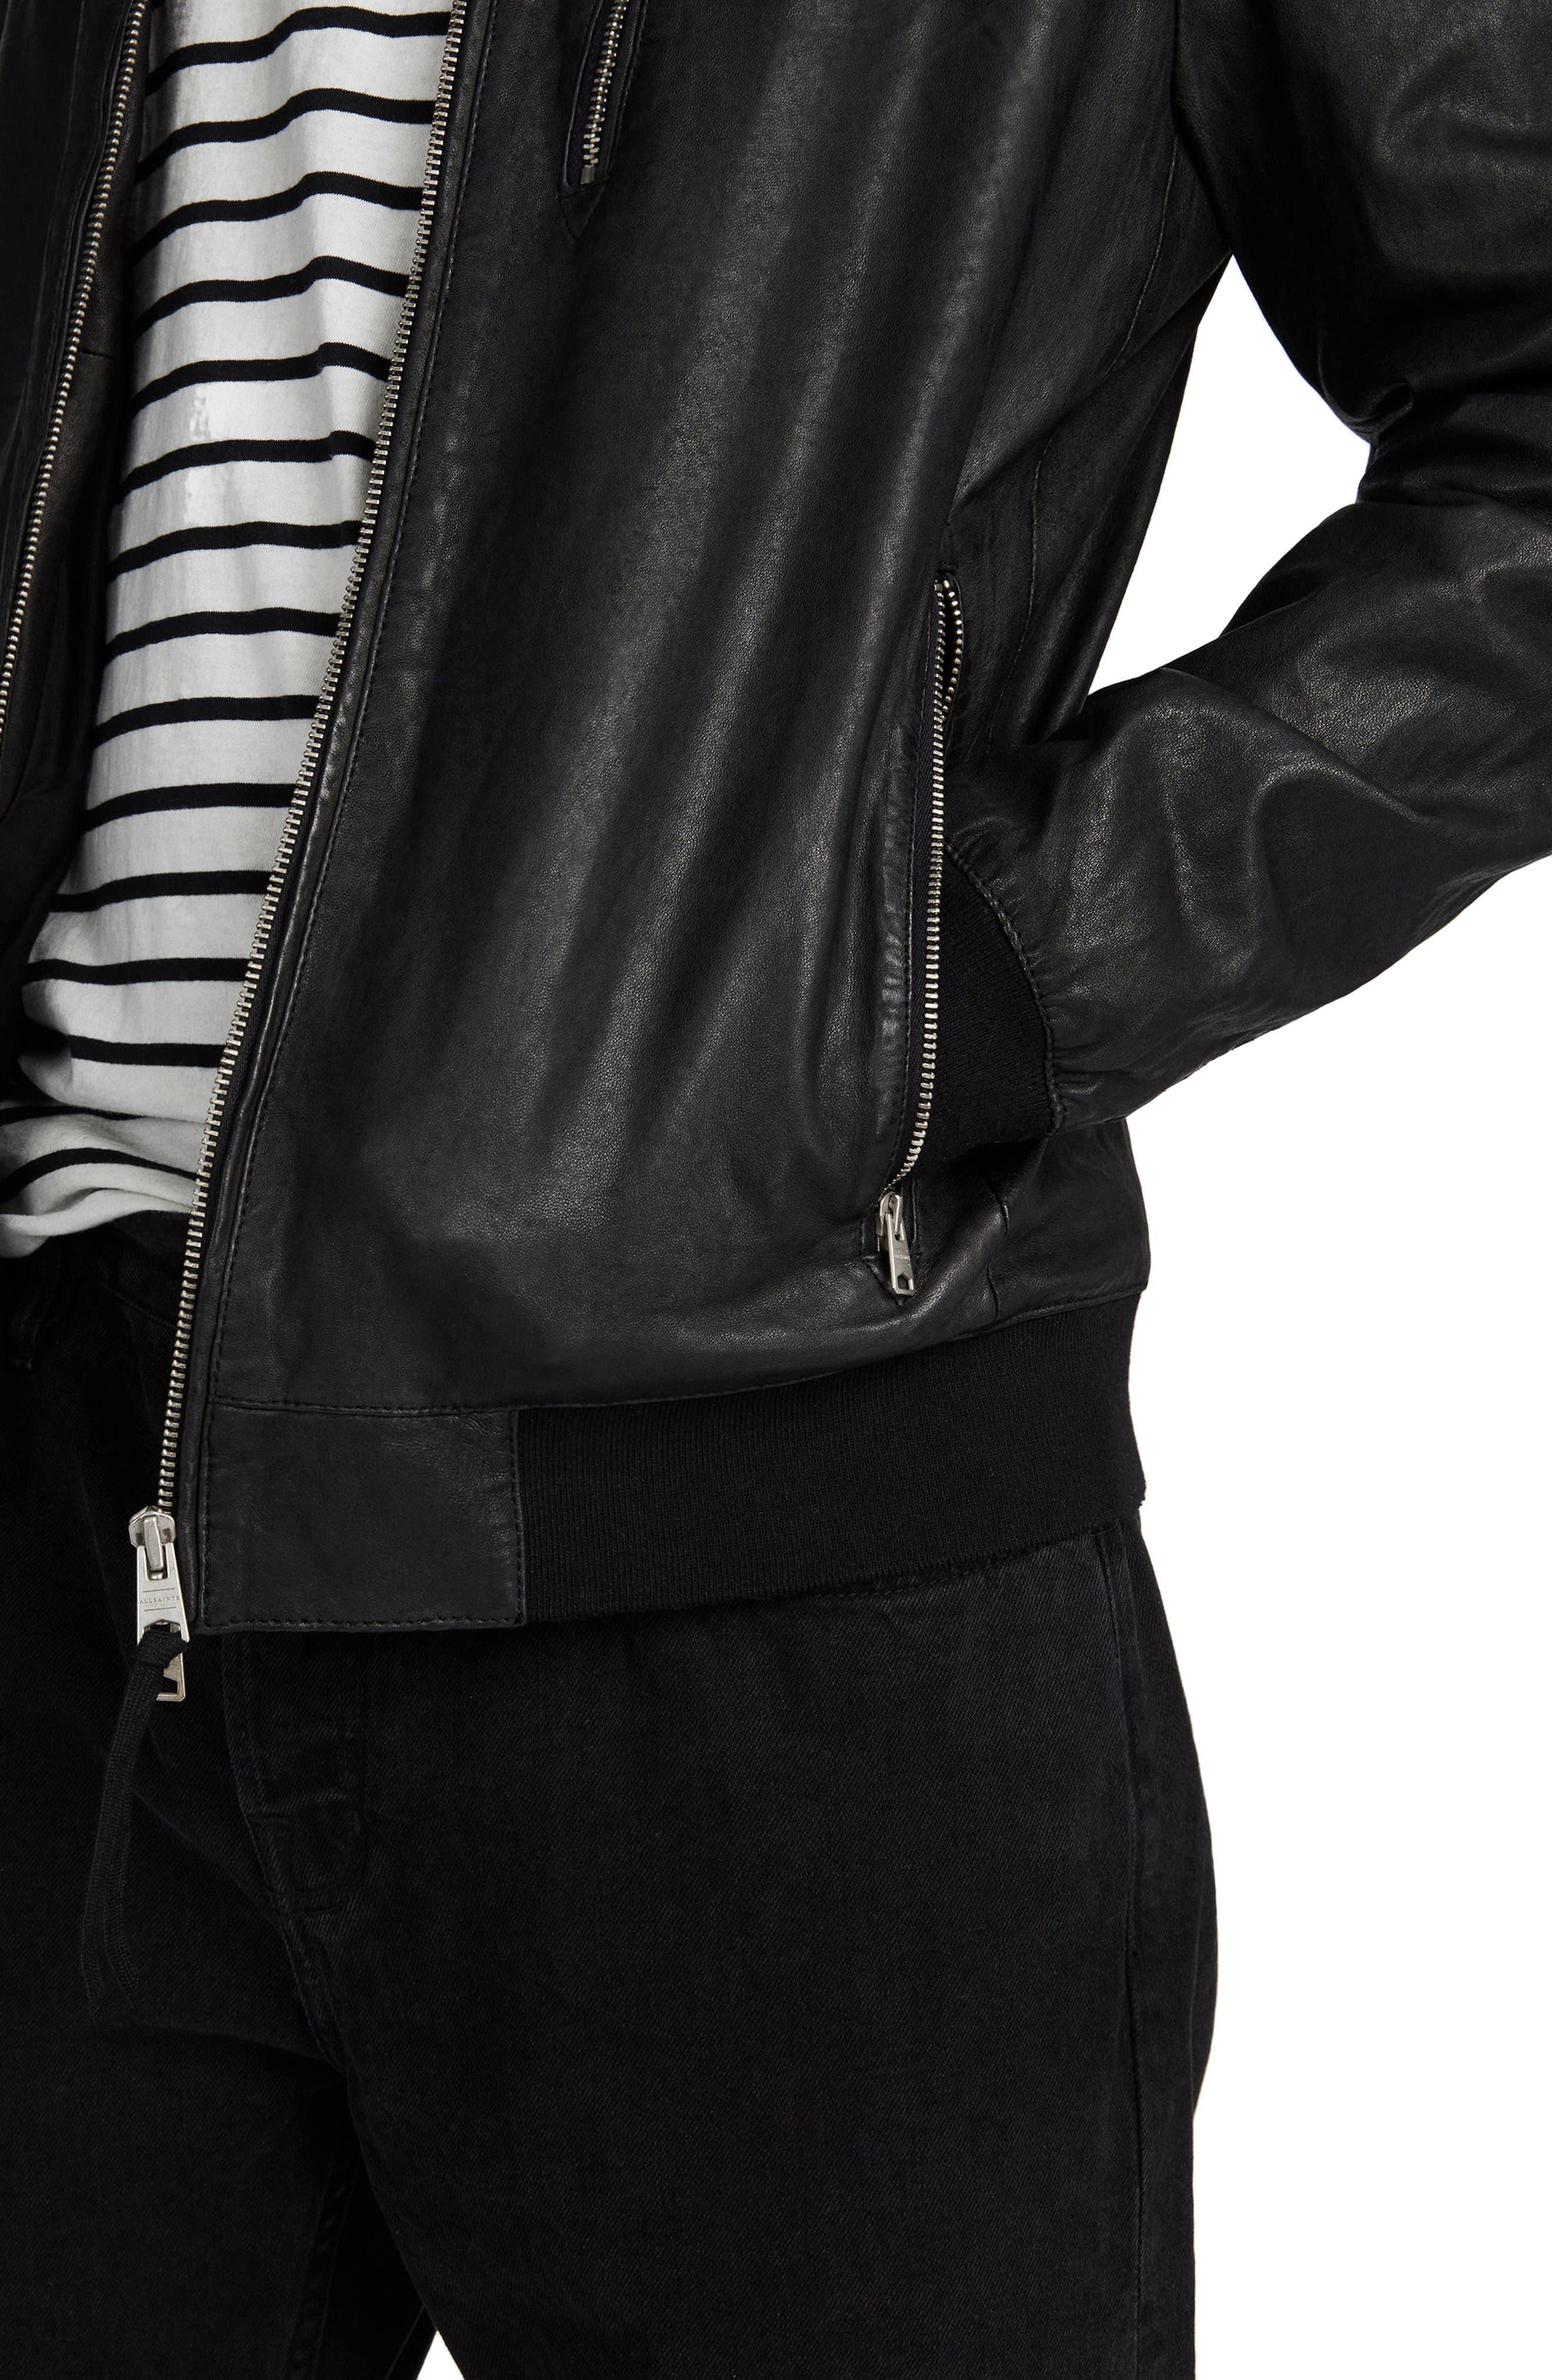 ALLSAINTS, Kino Leather Bomber Jacket, Alternate thumbnail 3, color, BLACK